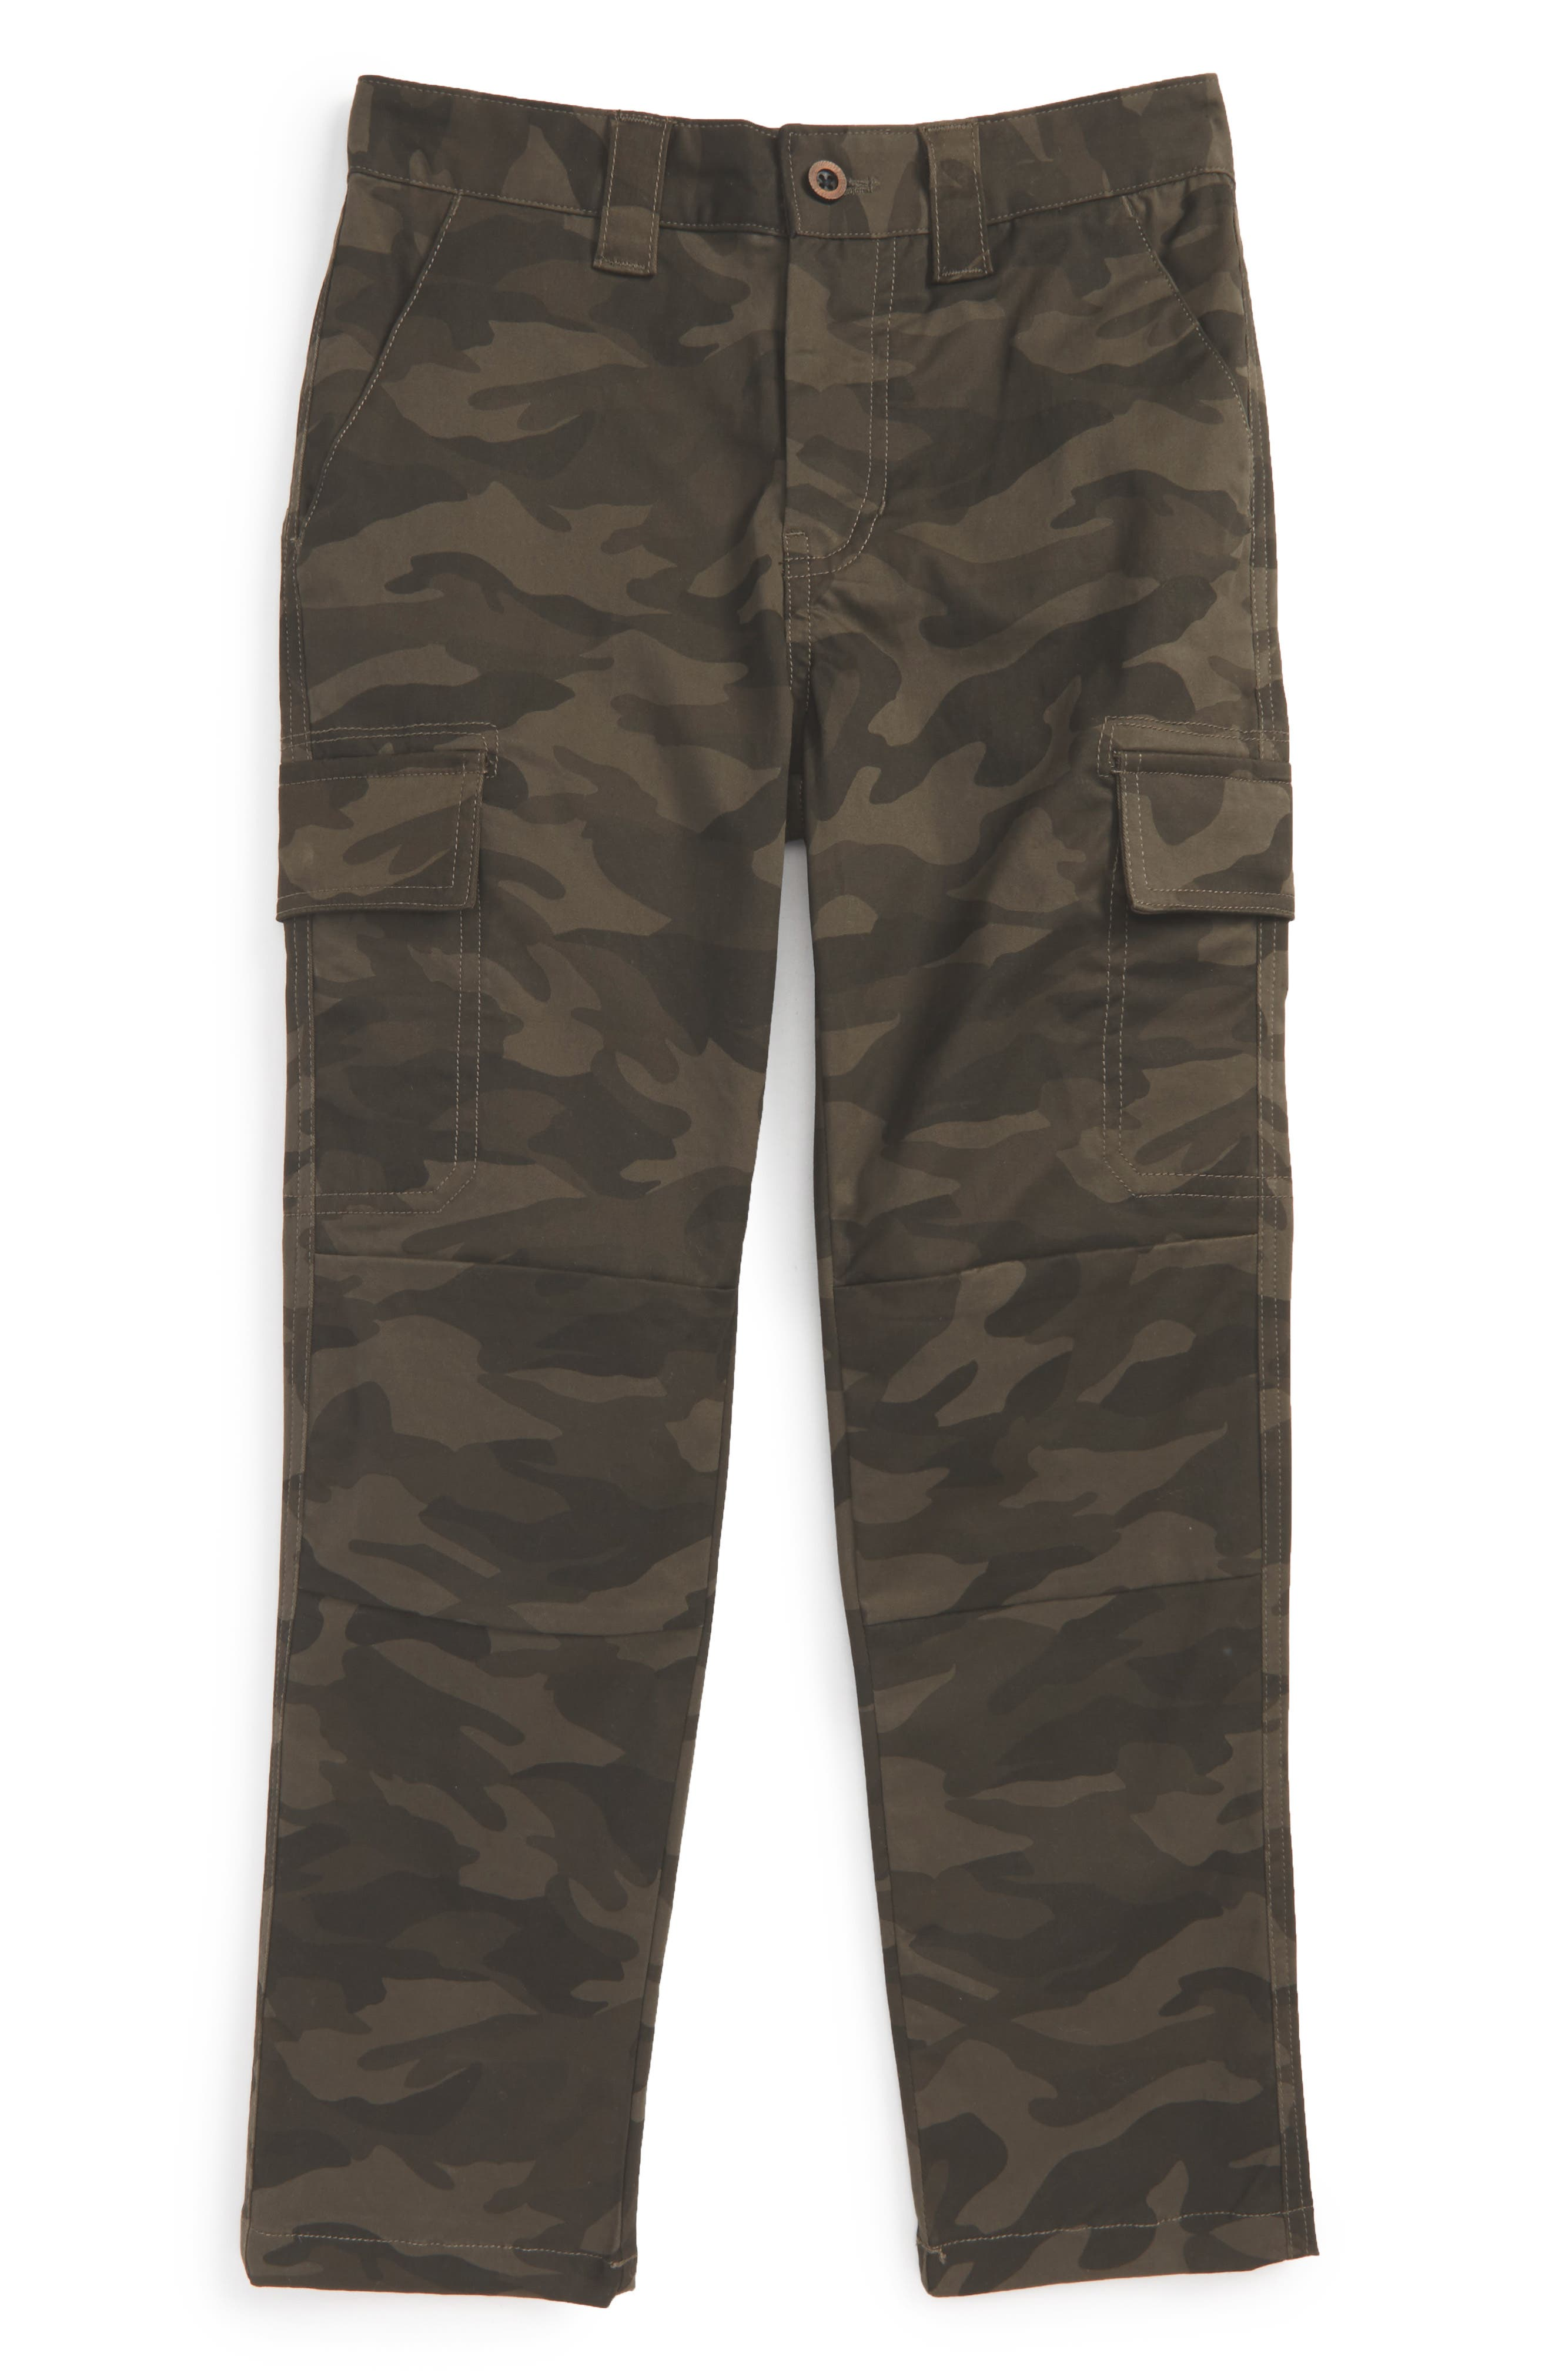 Z.A.K. Brand Cargo Pants (Little Boys & Big Boys)